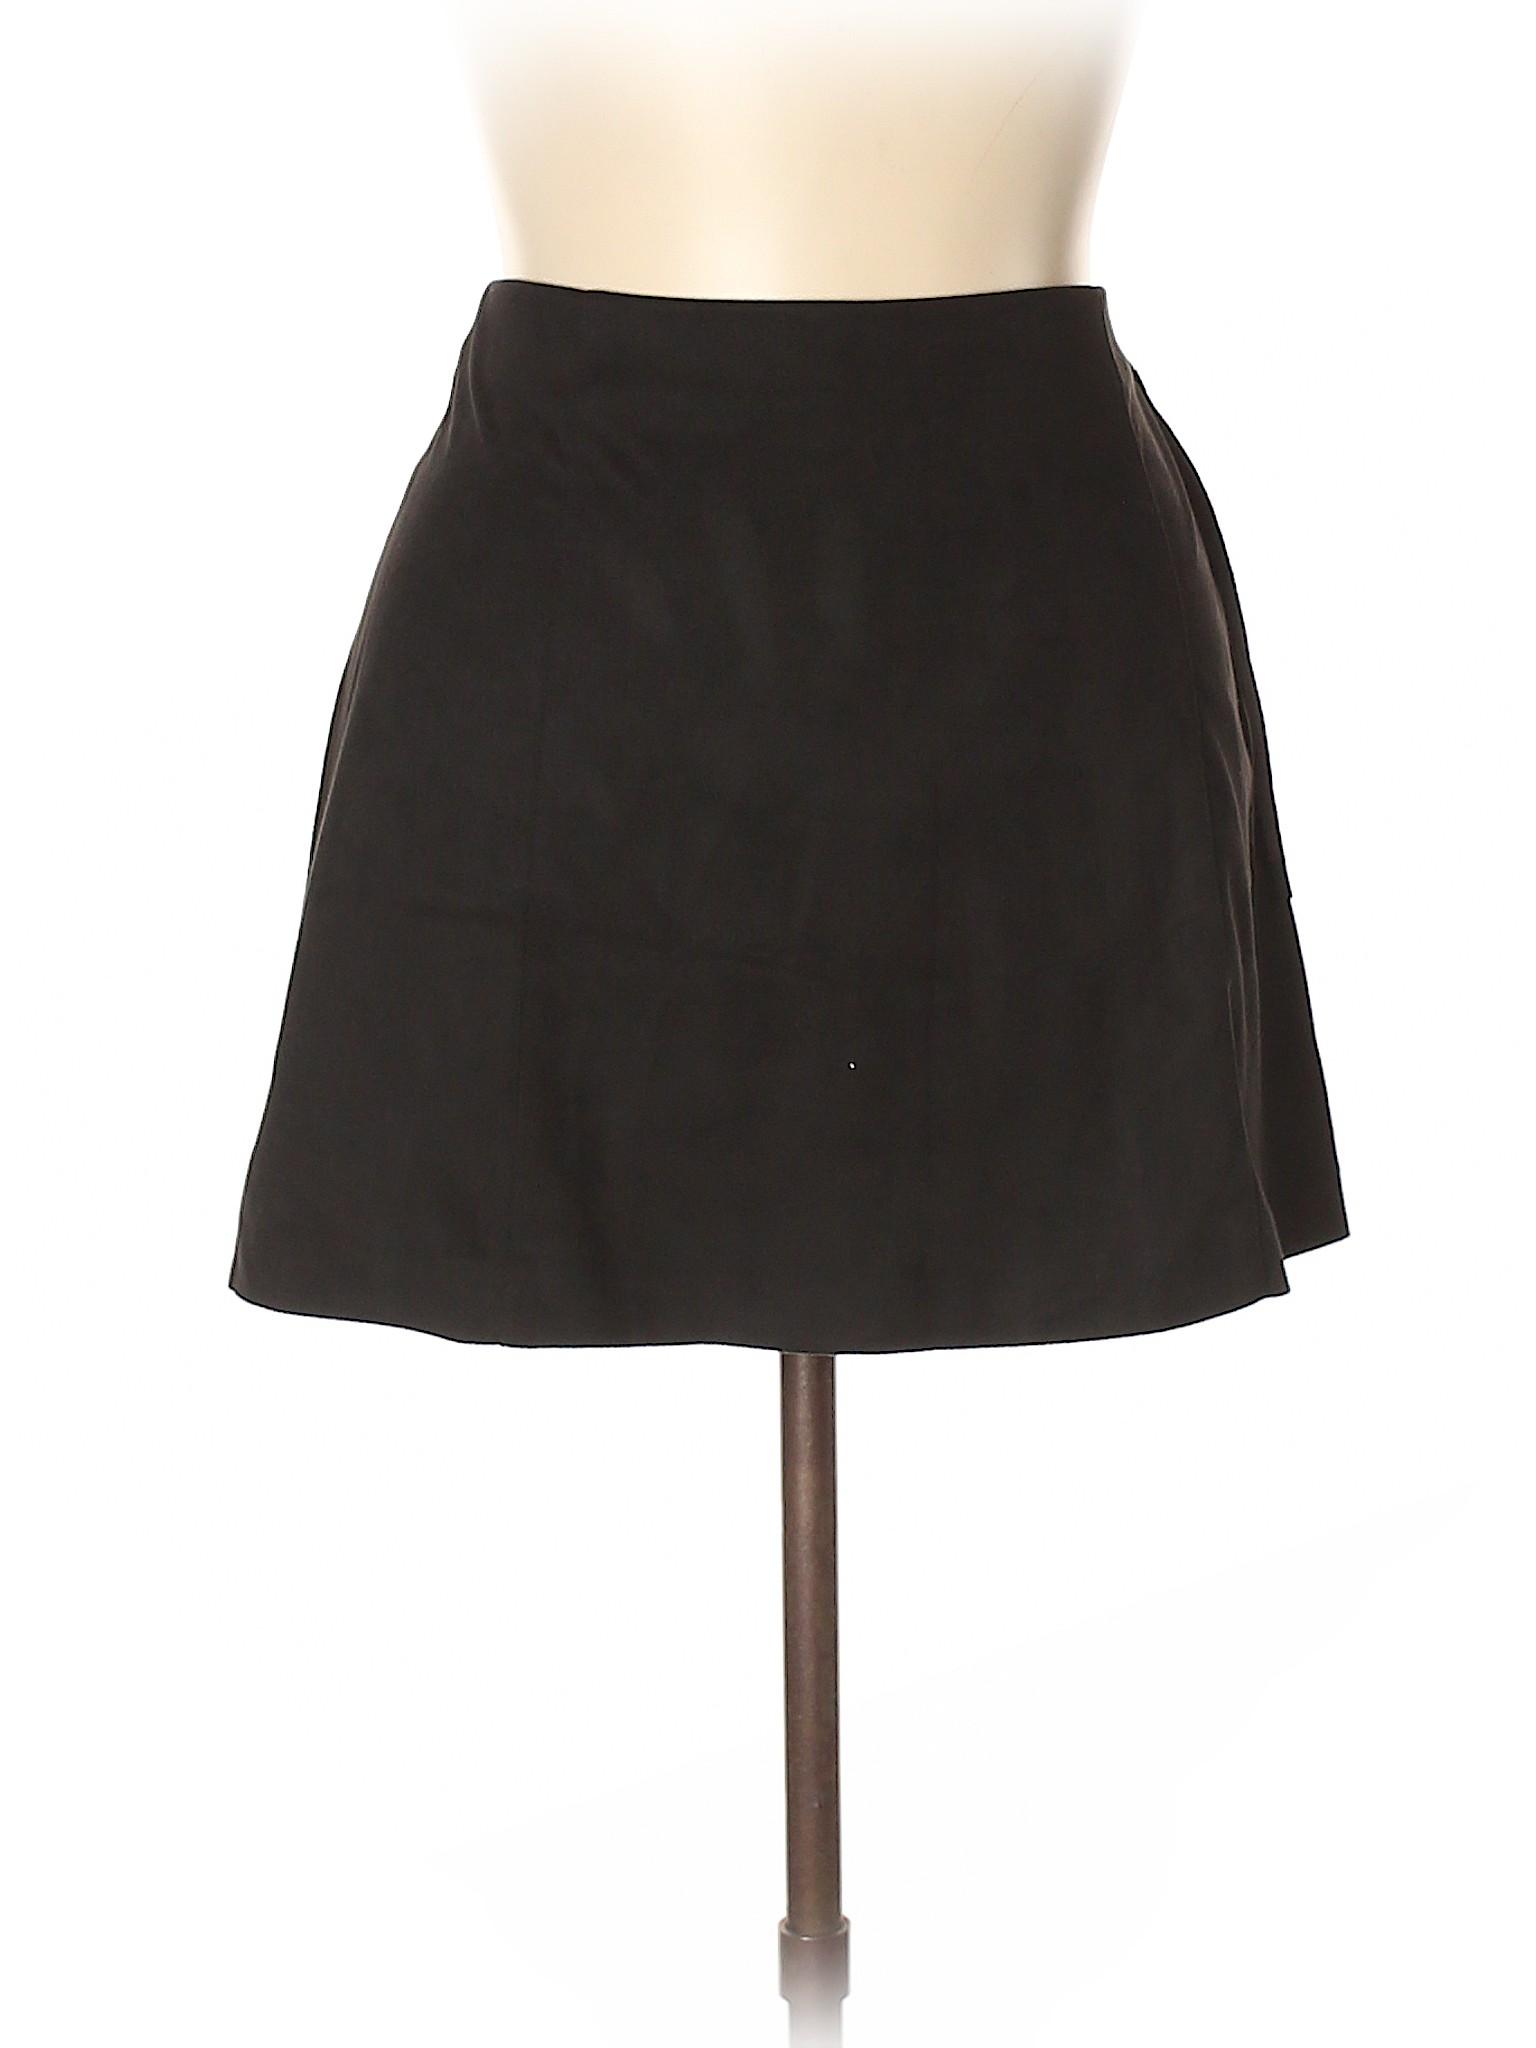 Boutique Skirt Boutique Skirt Casual Boutique Casual Skirt Boutique Casual wx5q45C6